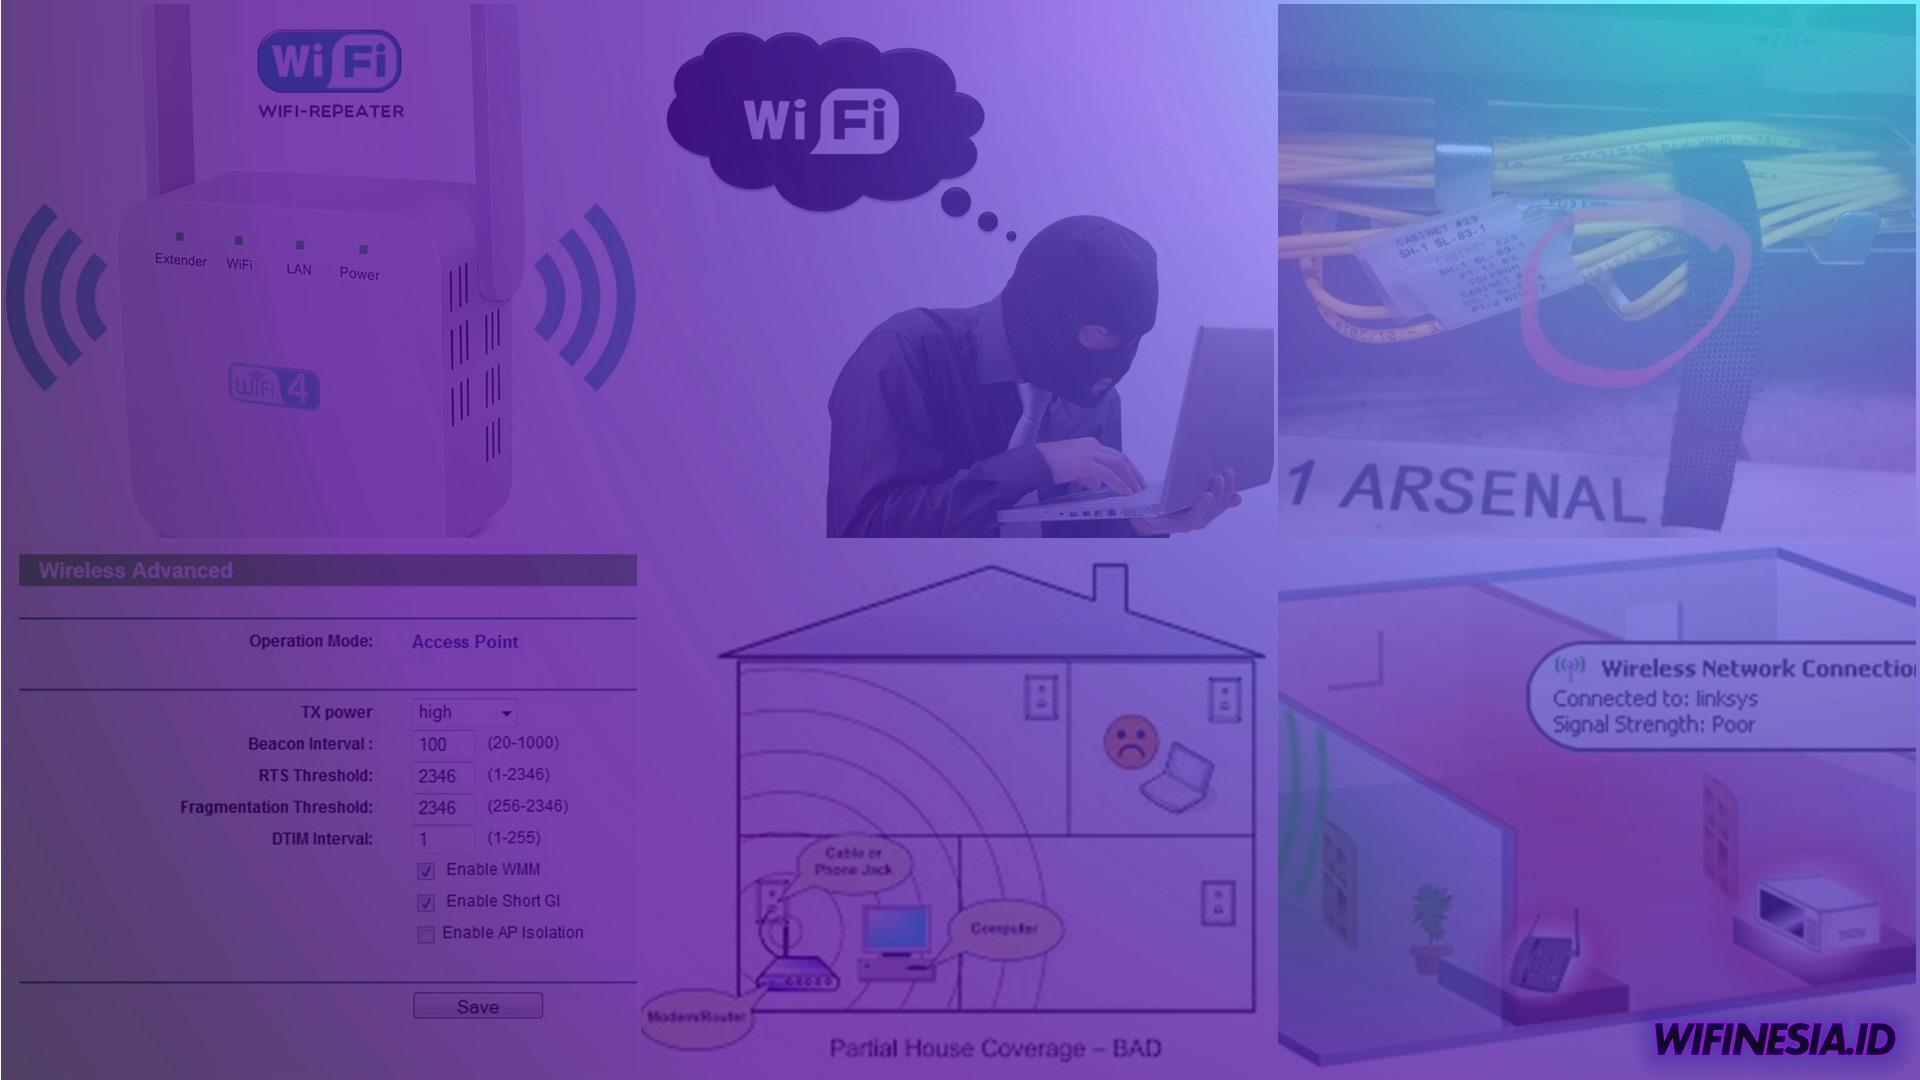 Cara Mengatasi WiFi Lemot Dijamin Ampuh & Sederhana